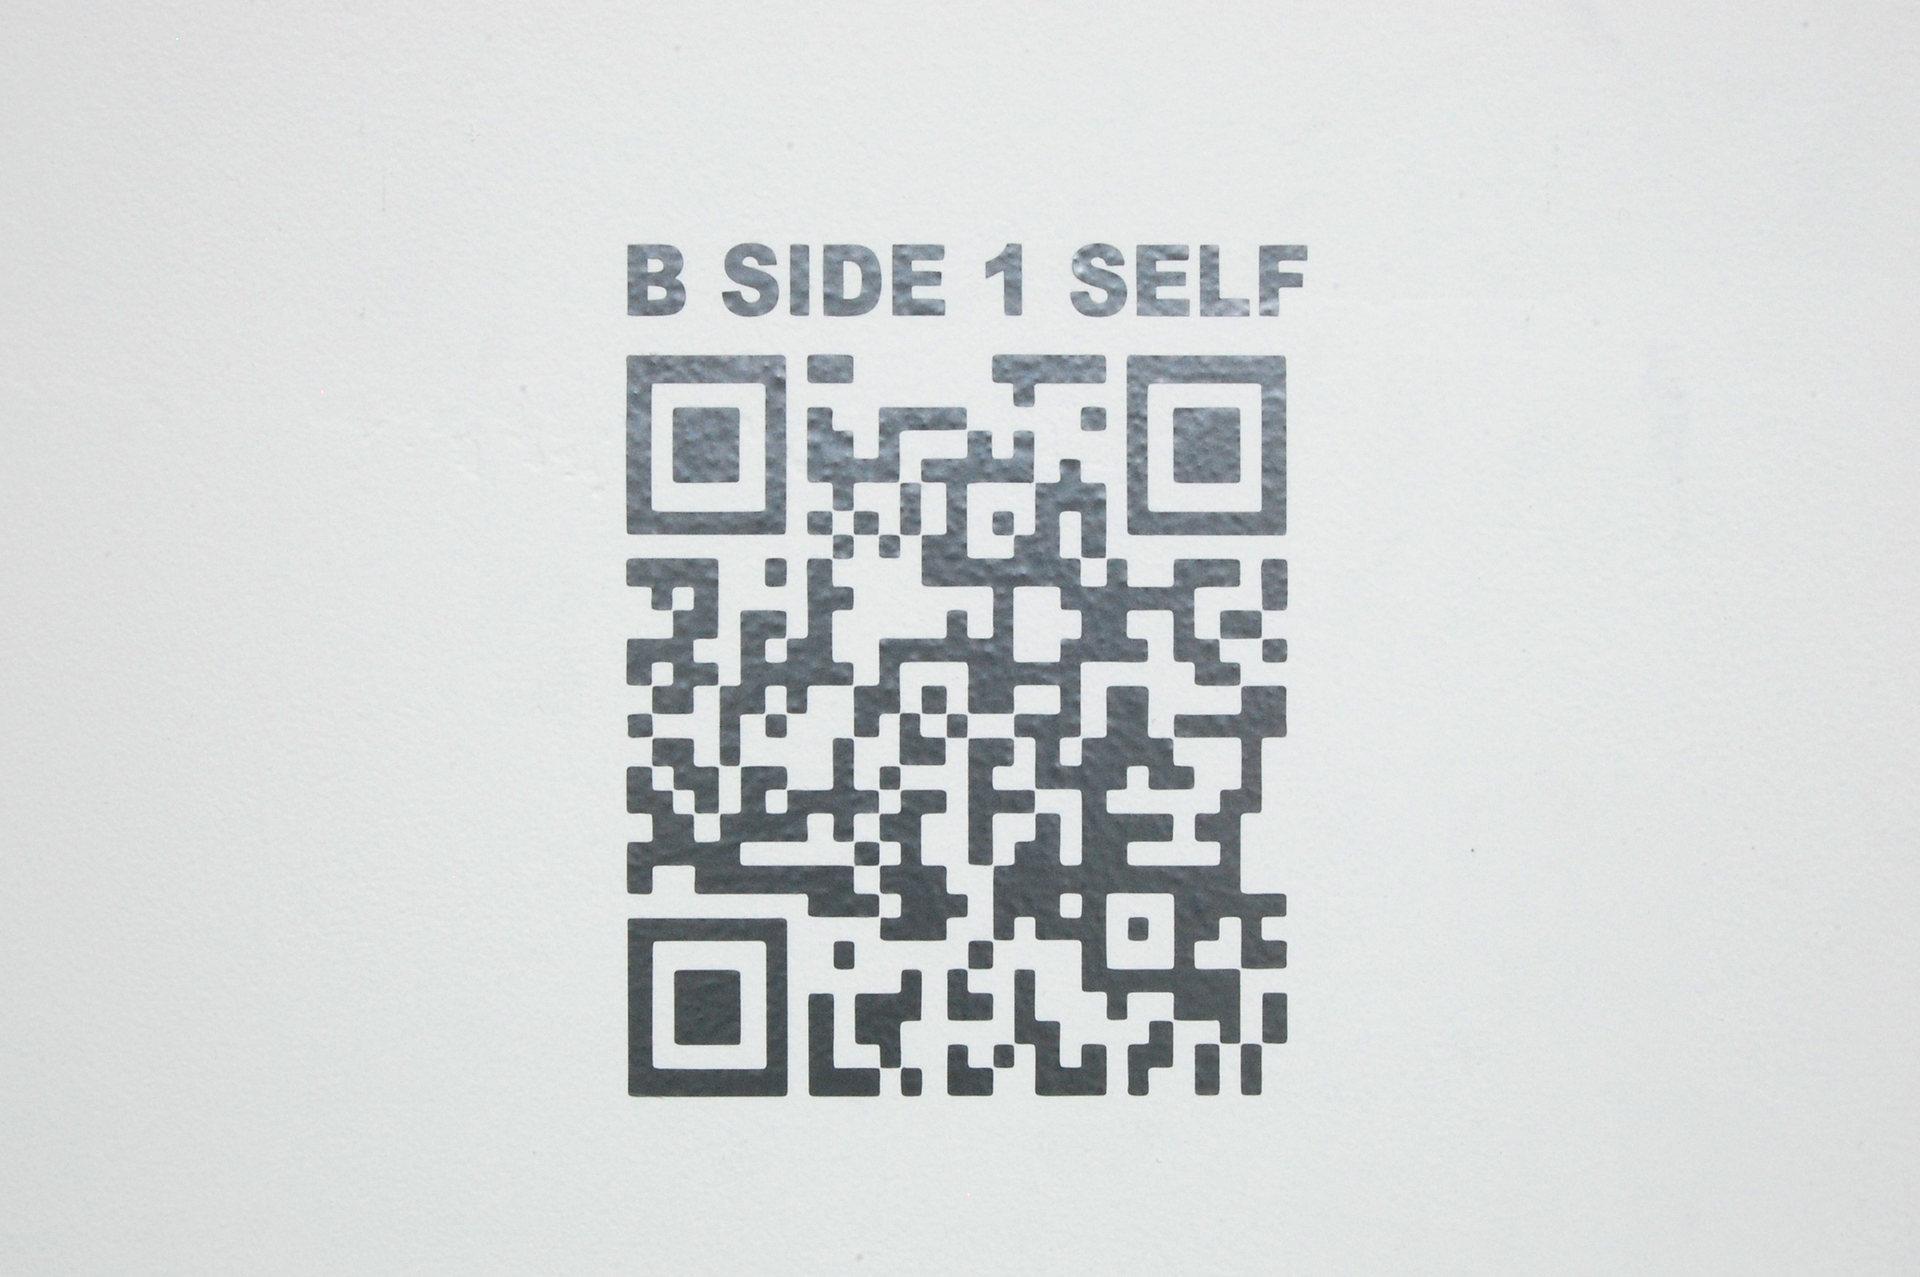 bside1self